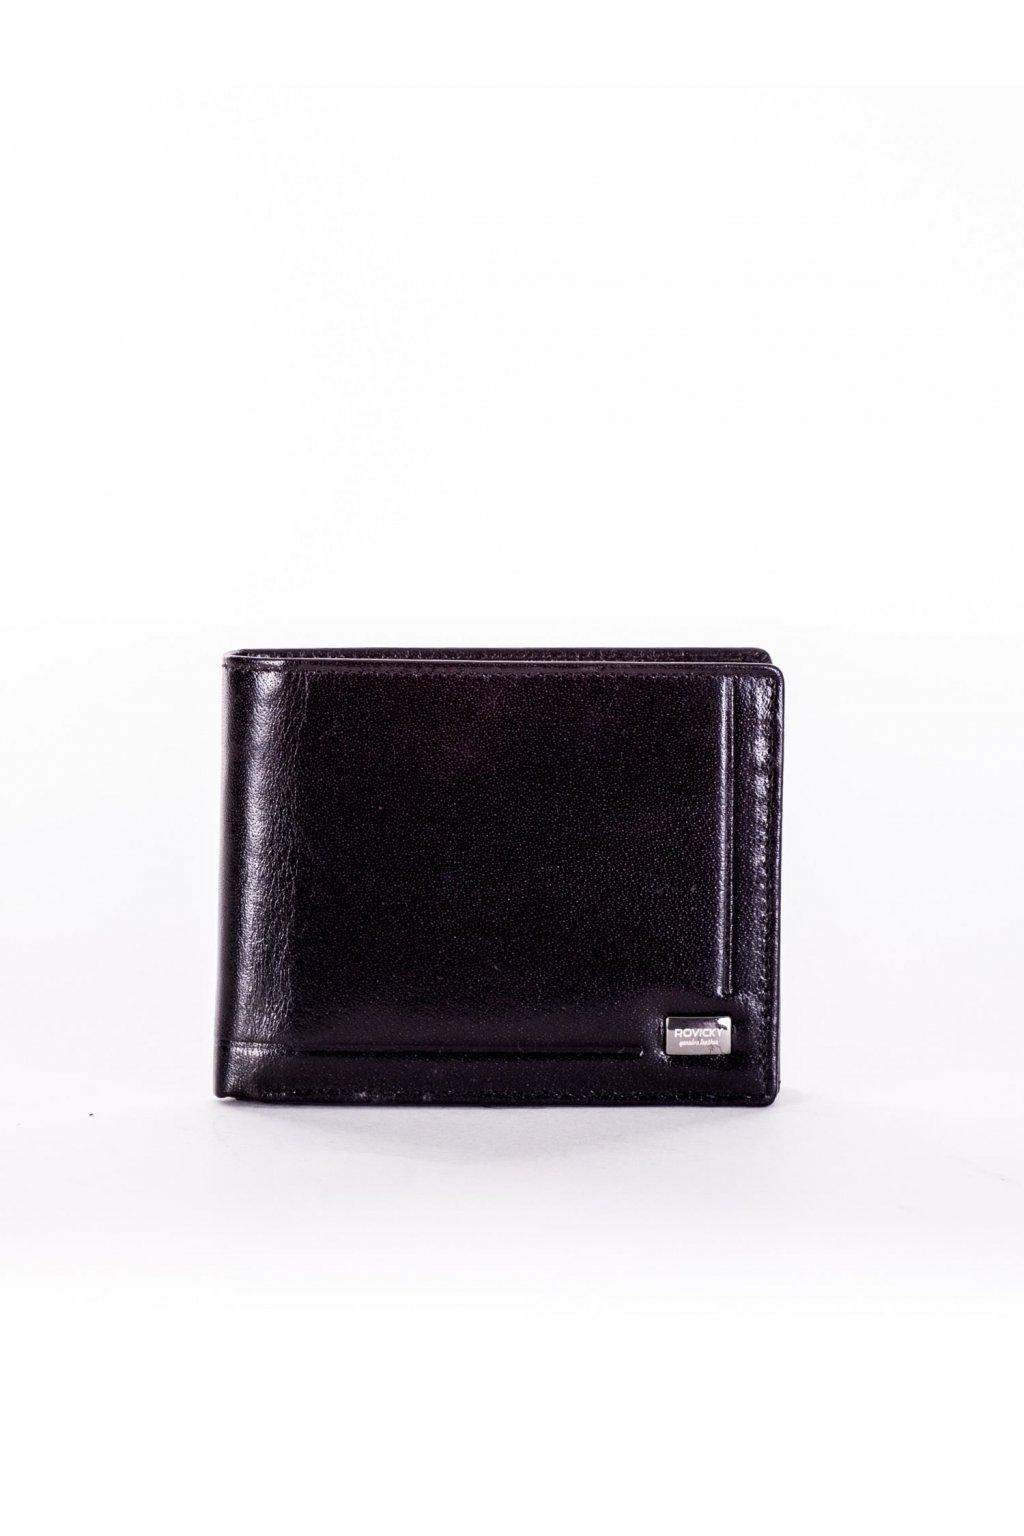 Pánska peňaženka kód CE-PR-PC-103-BAR.12